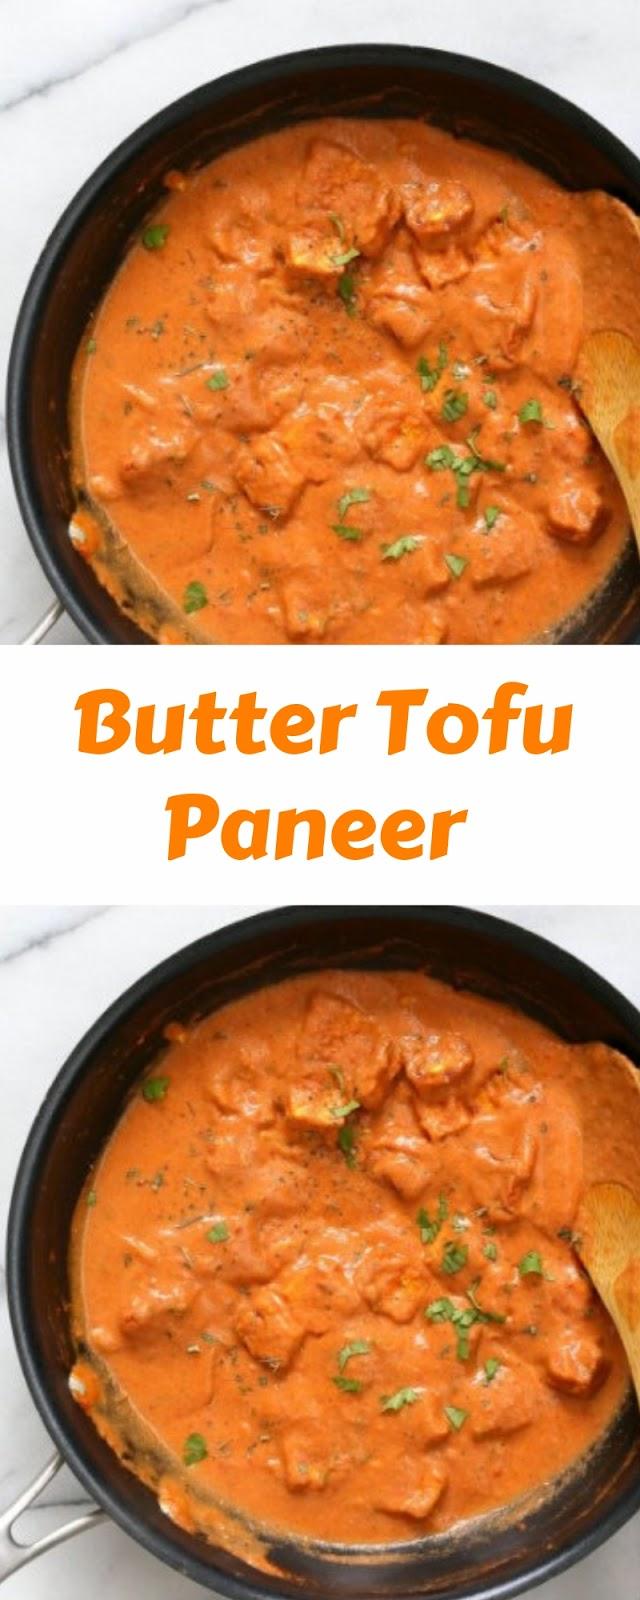 Butter Tofu Paneer